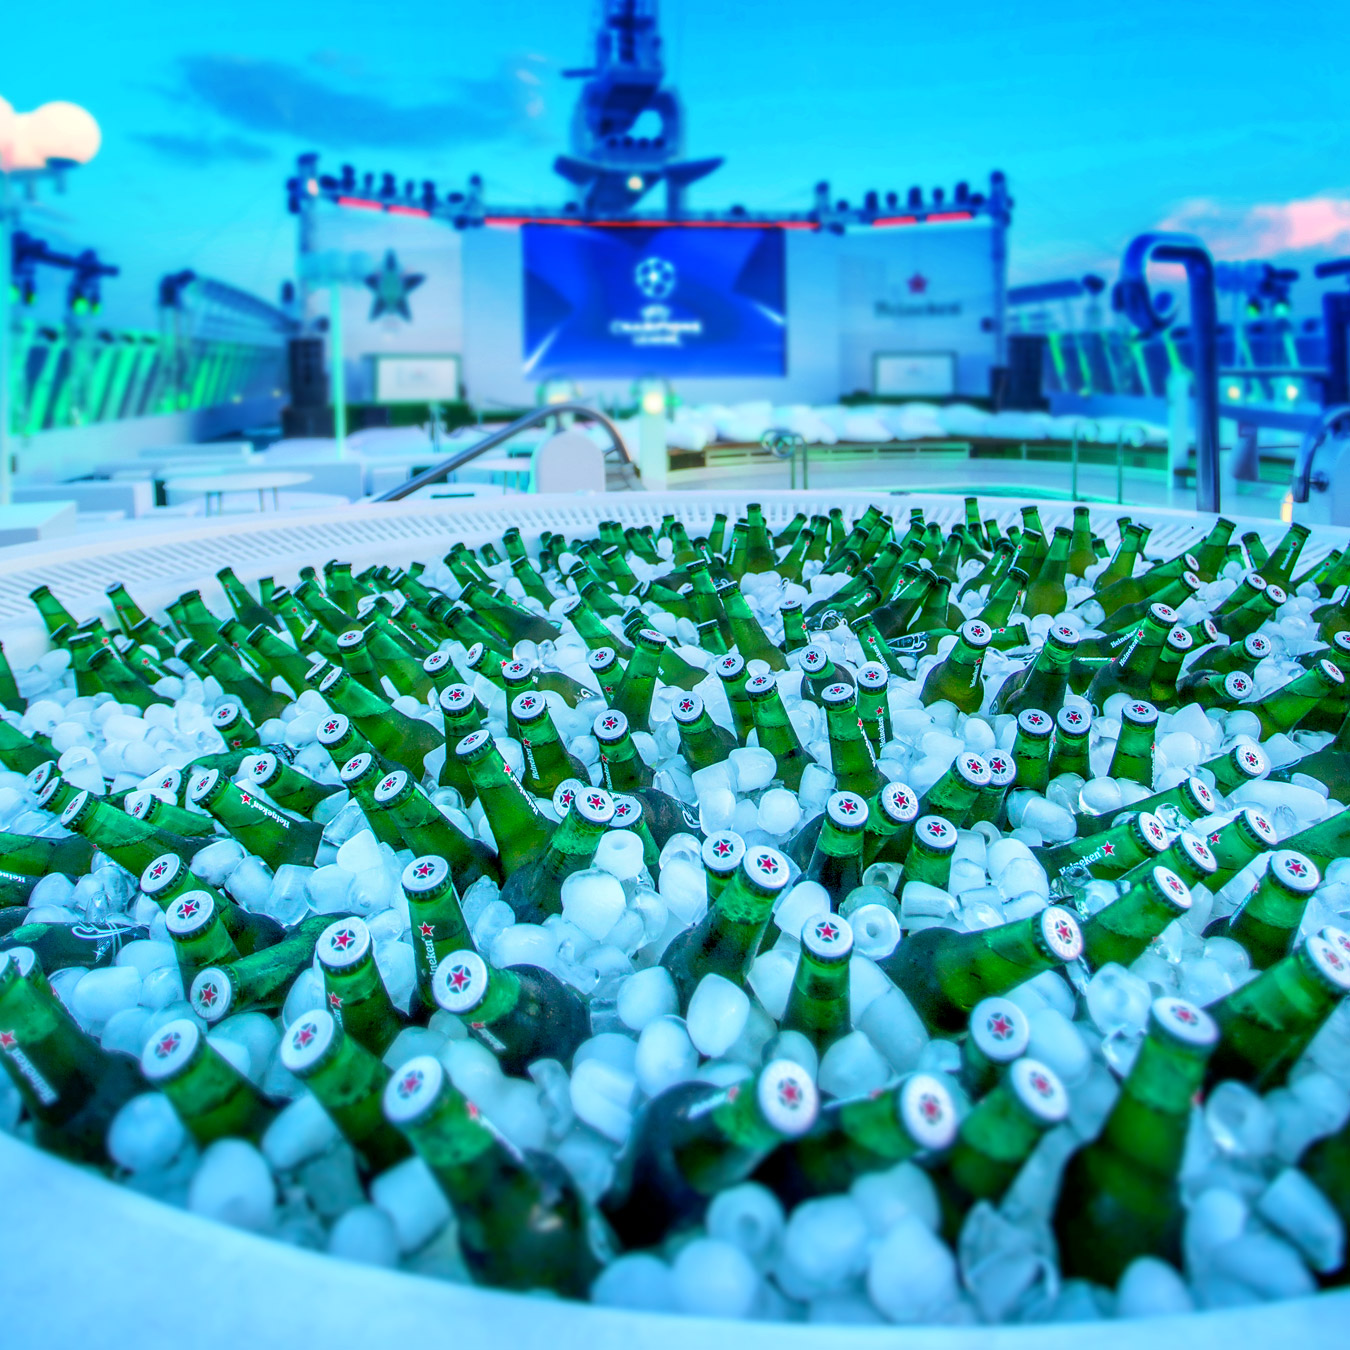 Heineken-square-image-05